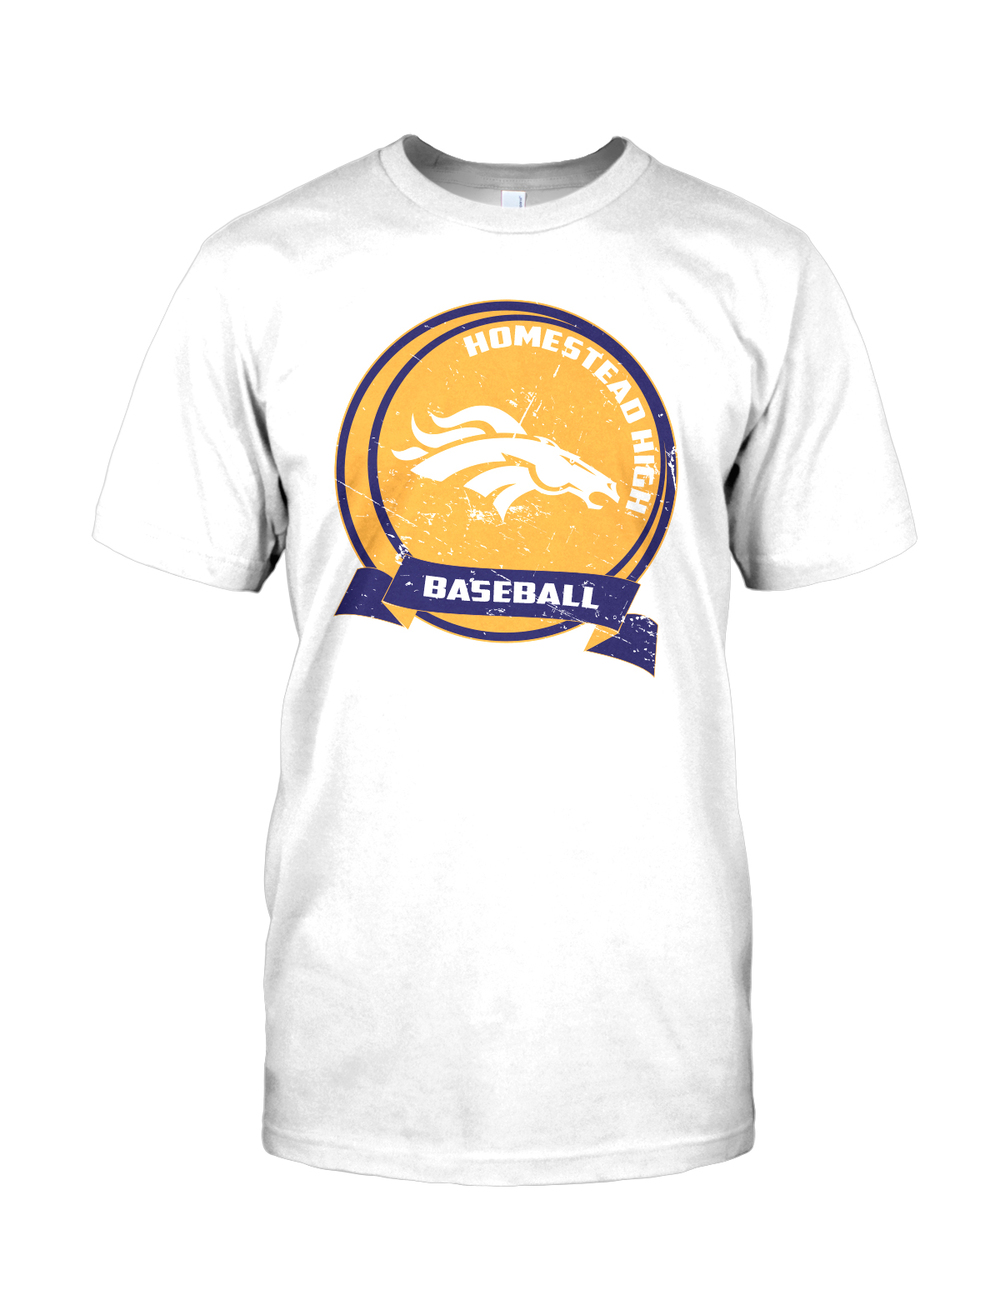 Tee-Design-Shirt9_o.jpg